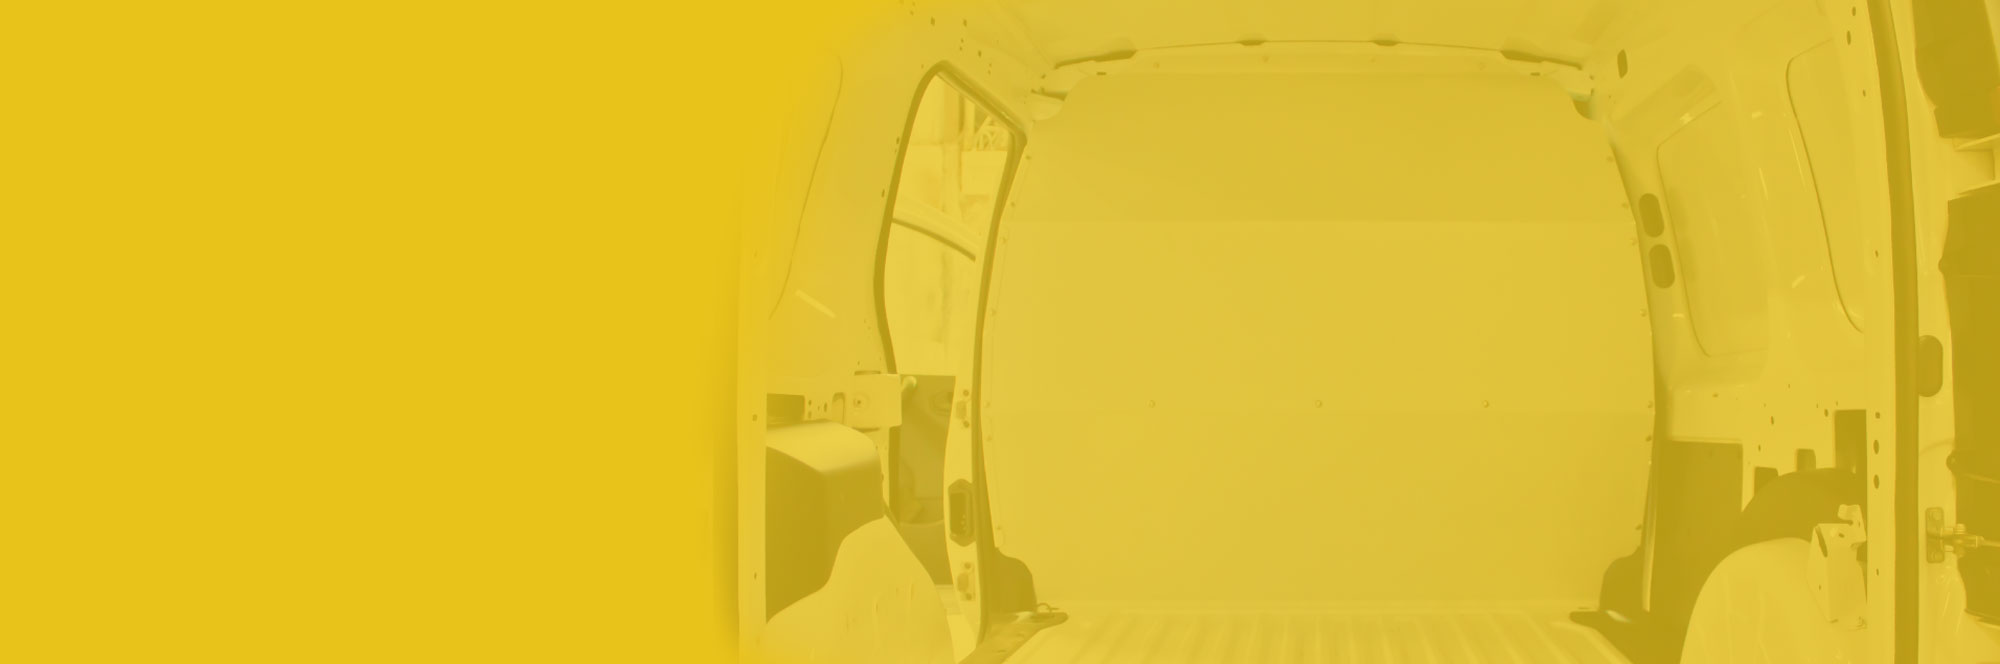 Van Bulkheads | Bulkheads for Vans | Van Guard Accessories